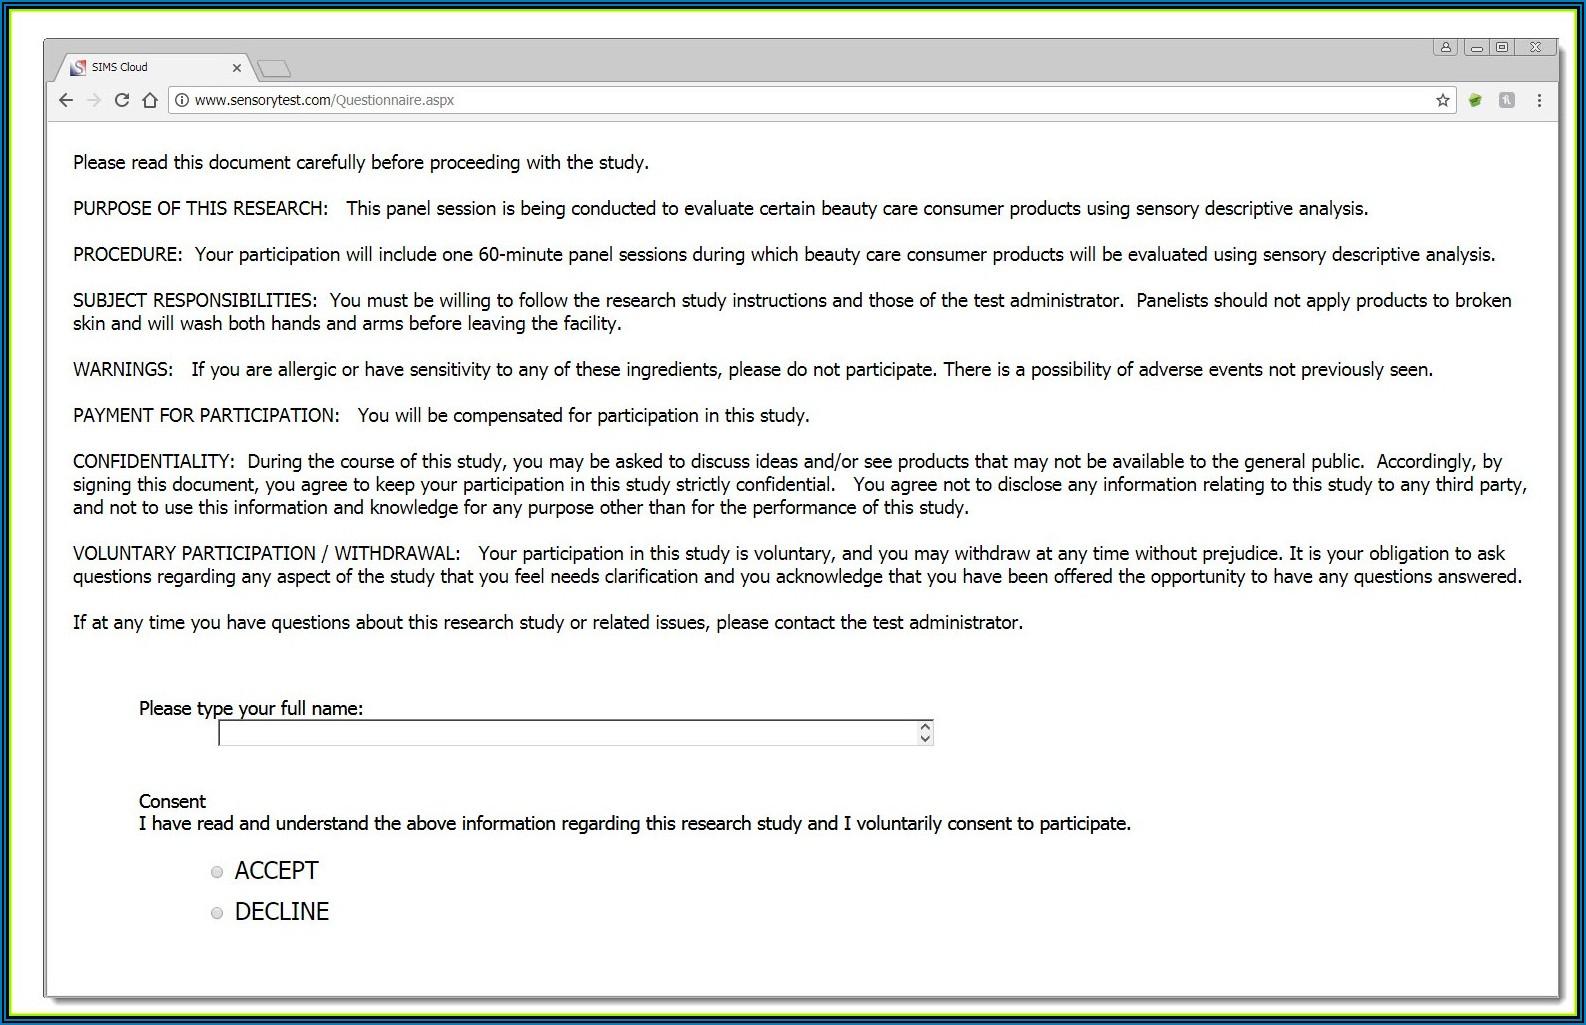 Digital Signature Approval Form